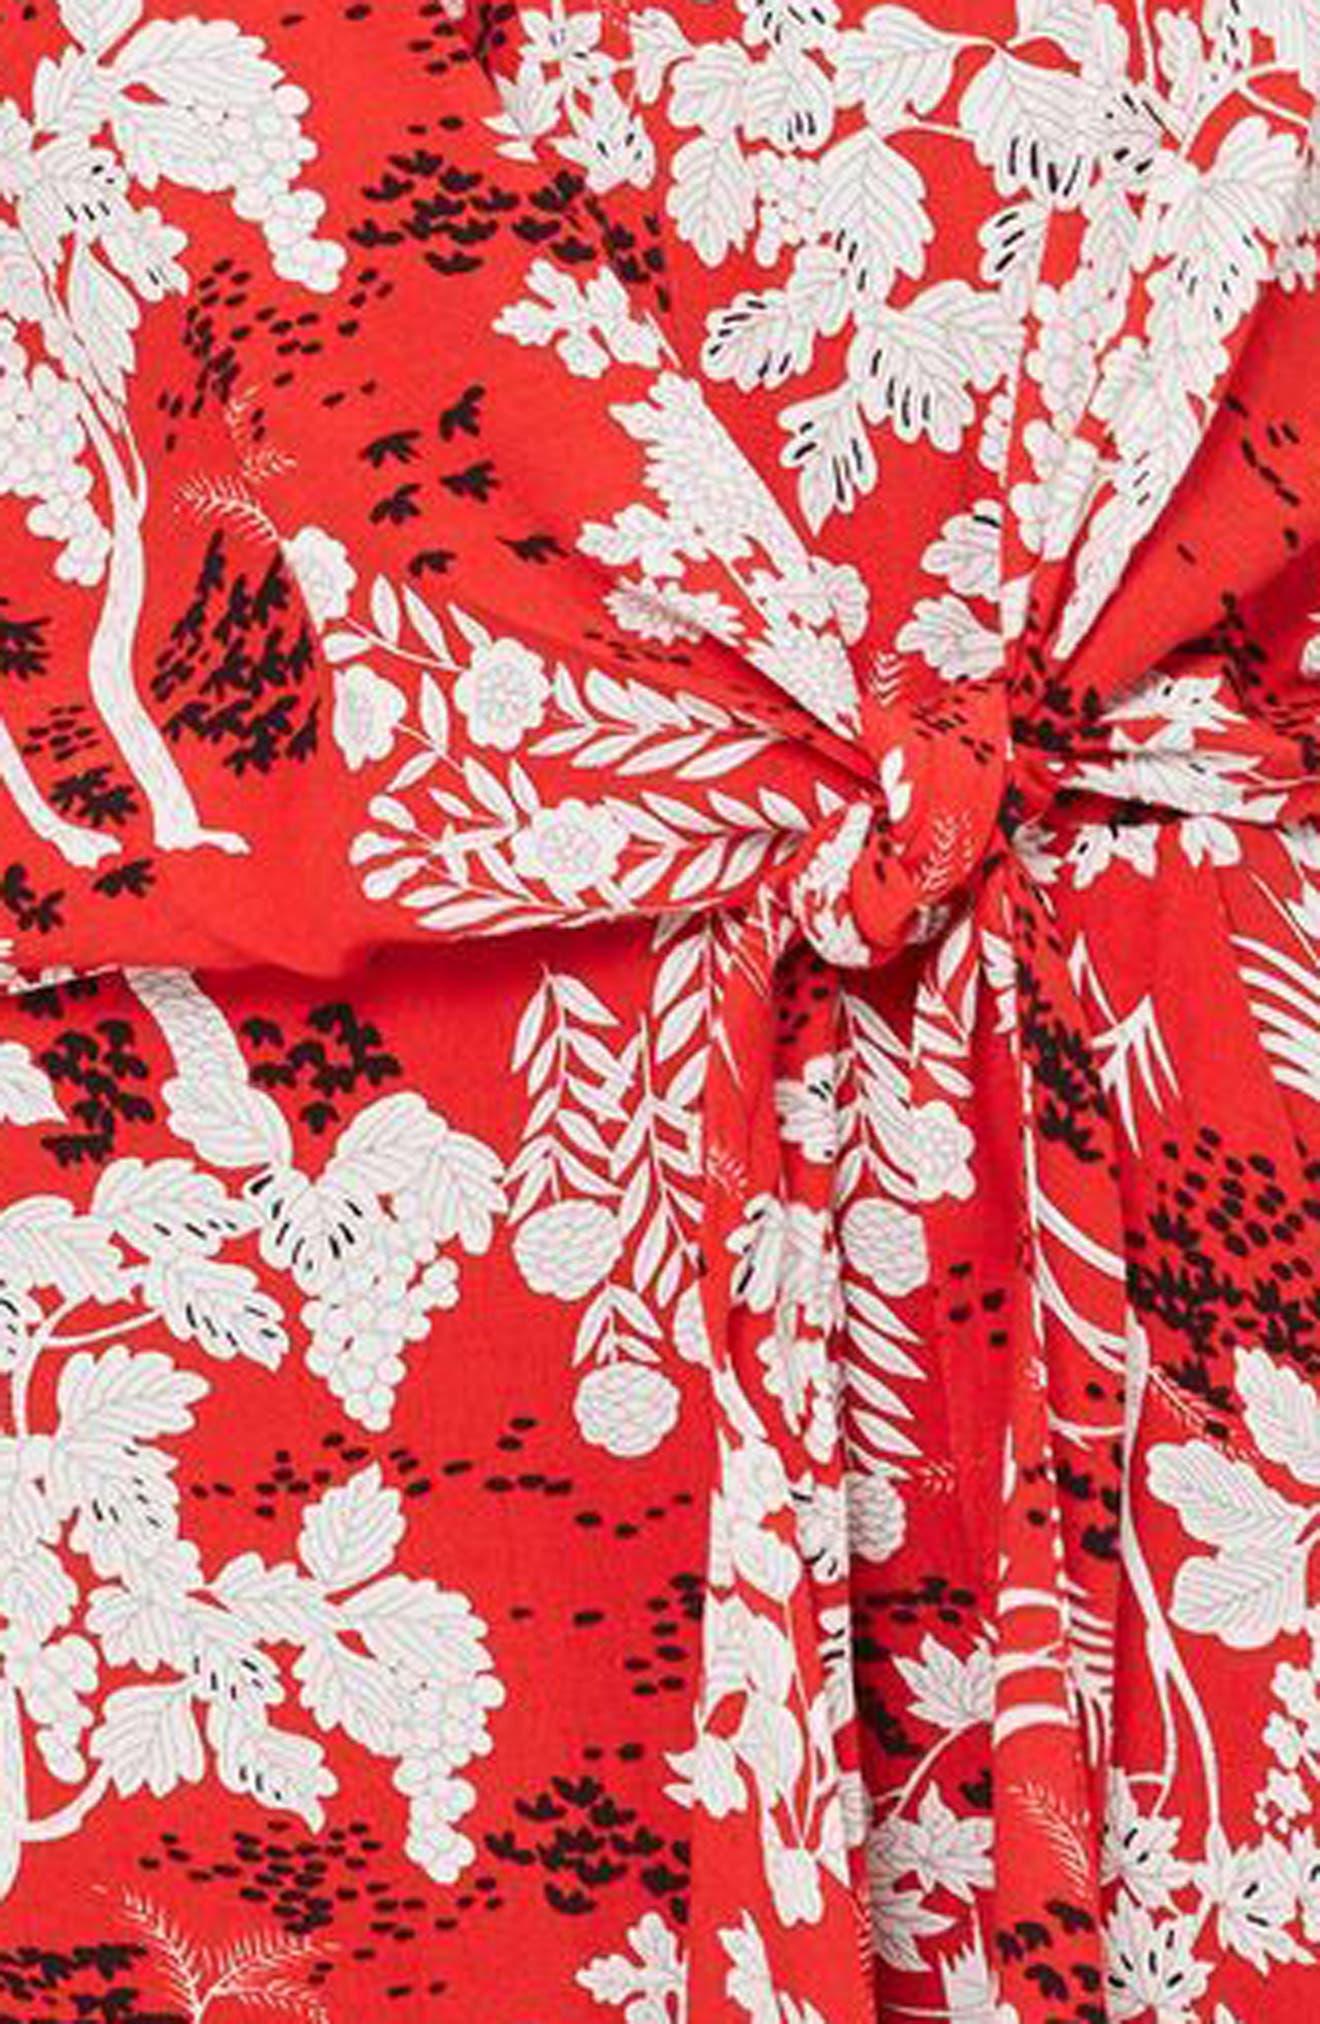 Knotted Midi Dress,                             Alternate thumbnail 3, color,                             Red Multi